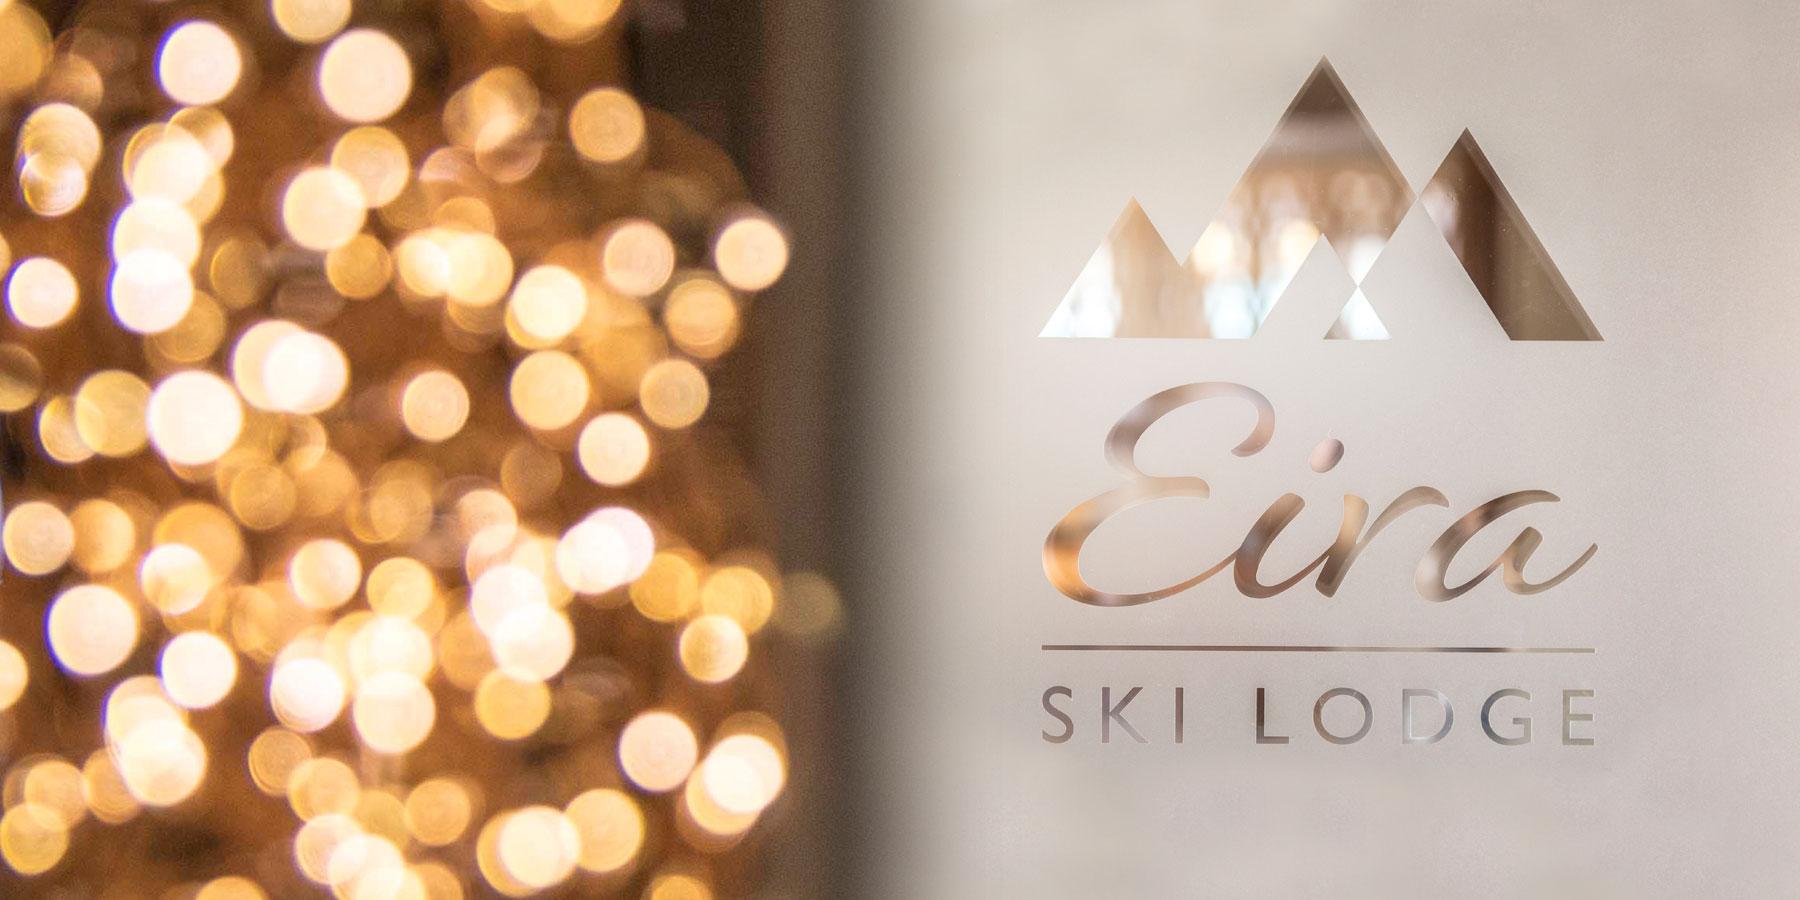 Eira Ski Lodge logo on glass door